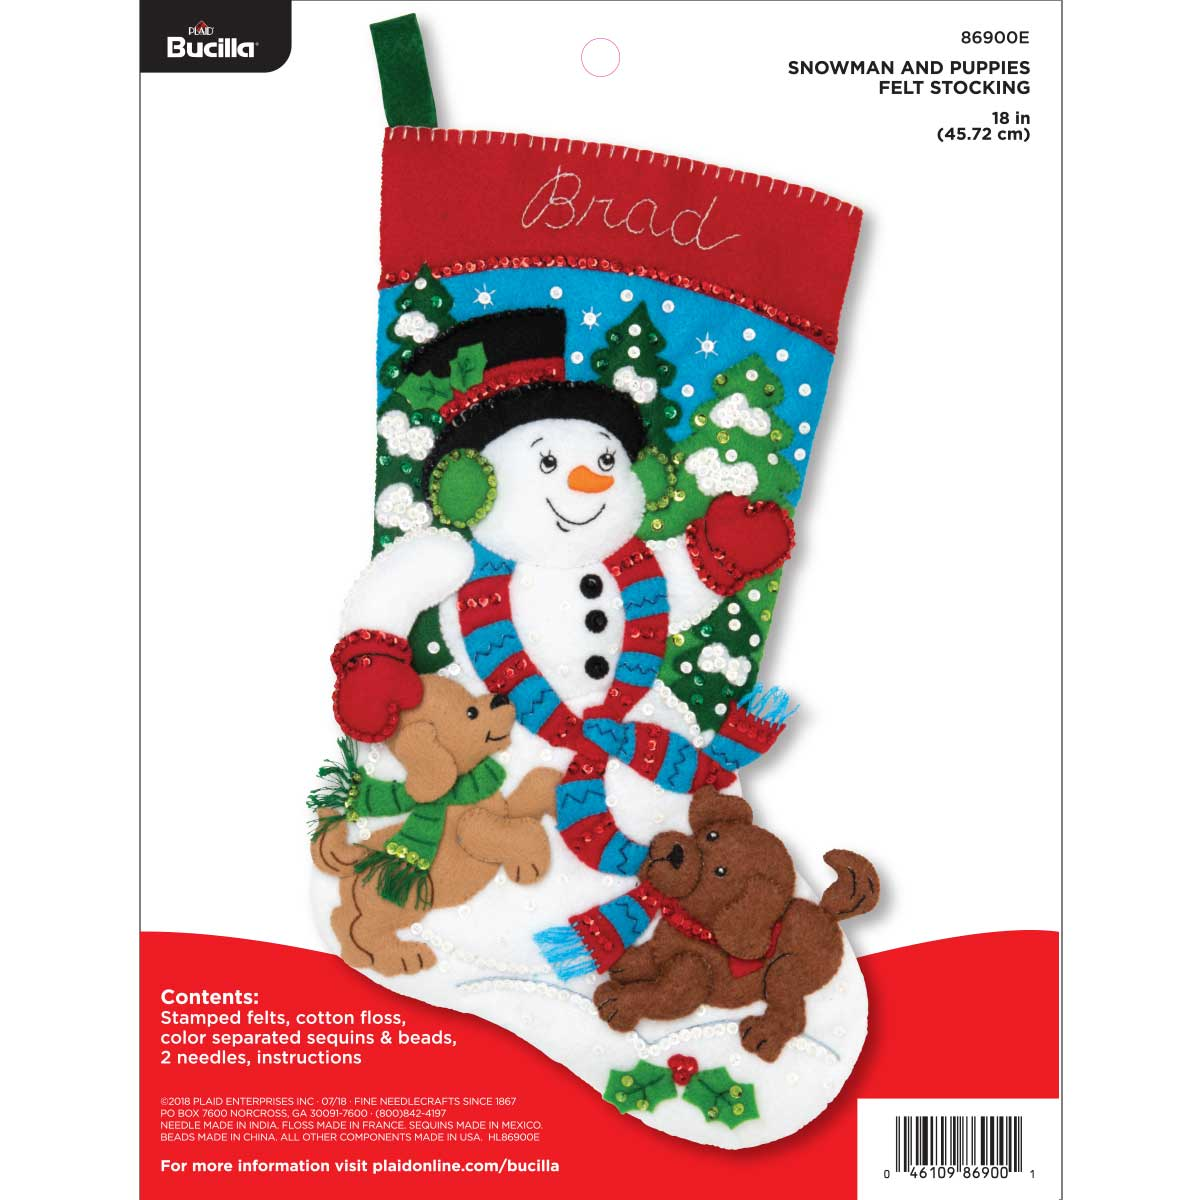 Bucilla ® Seasonal - Felt - Stocking Kits - Snowman and Puppies